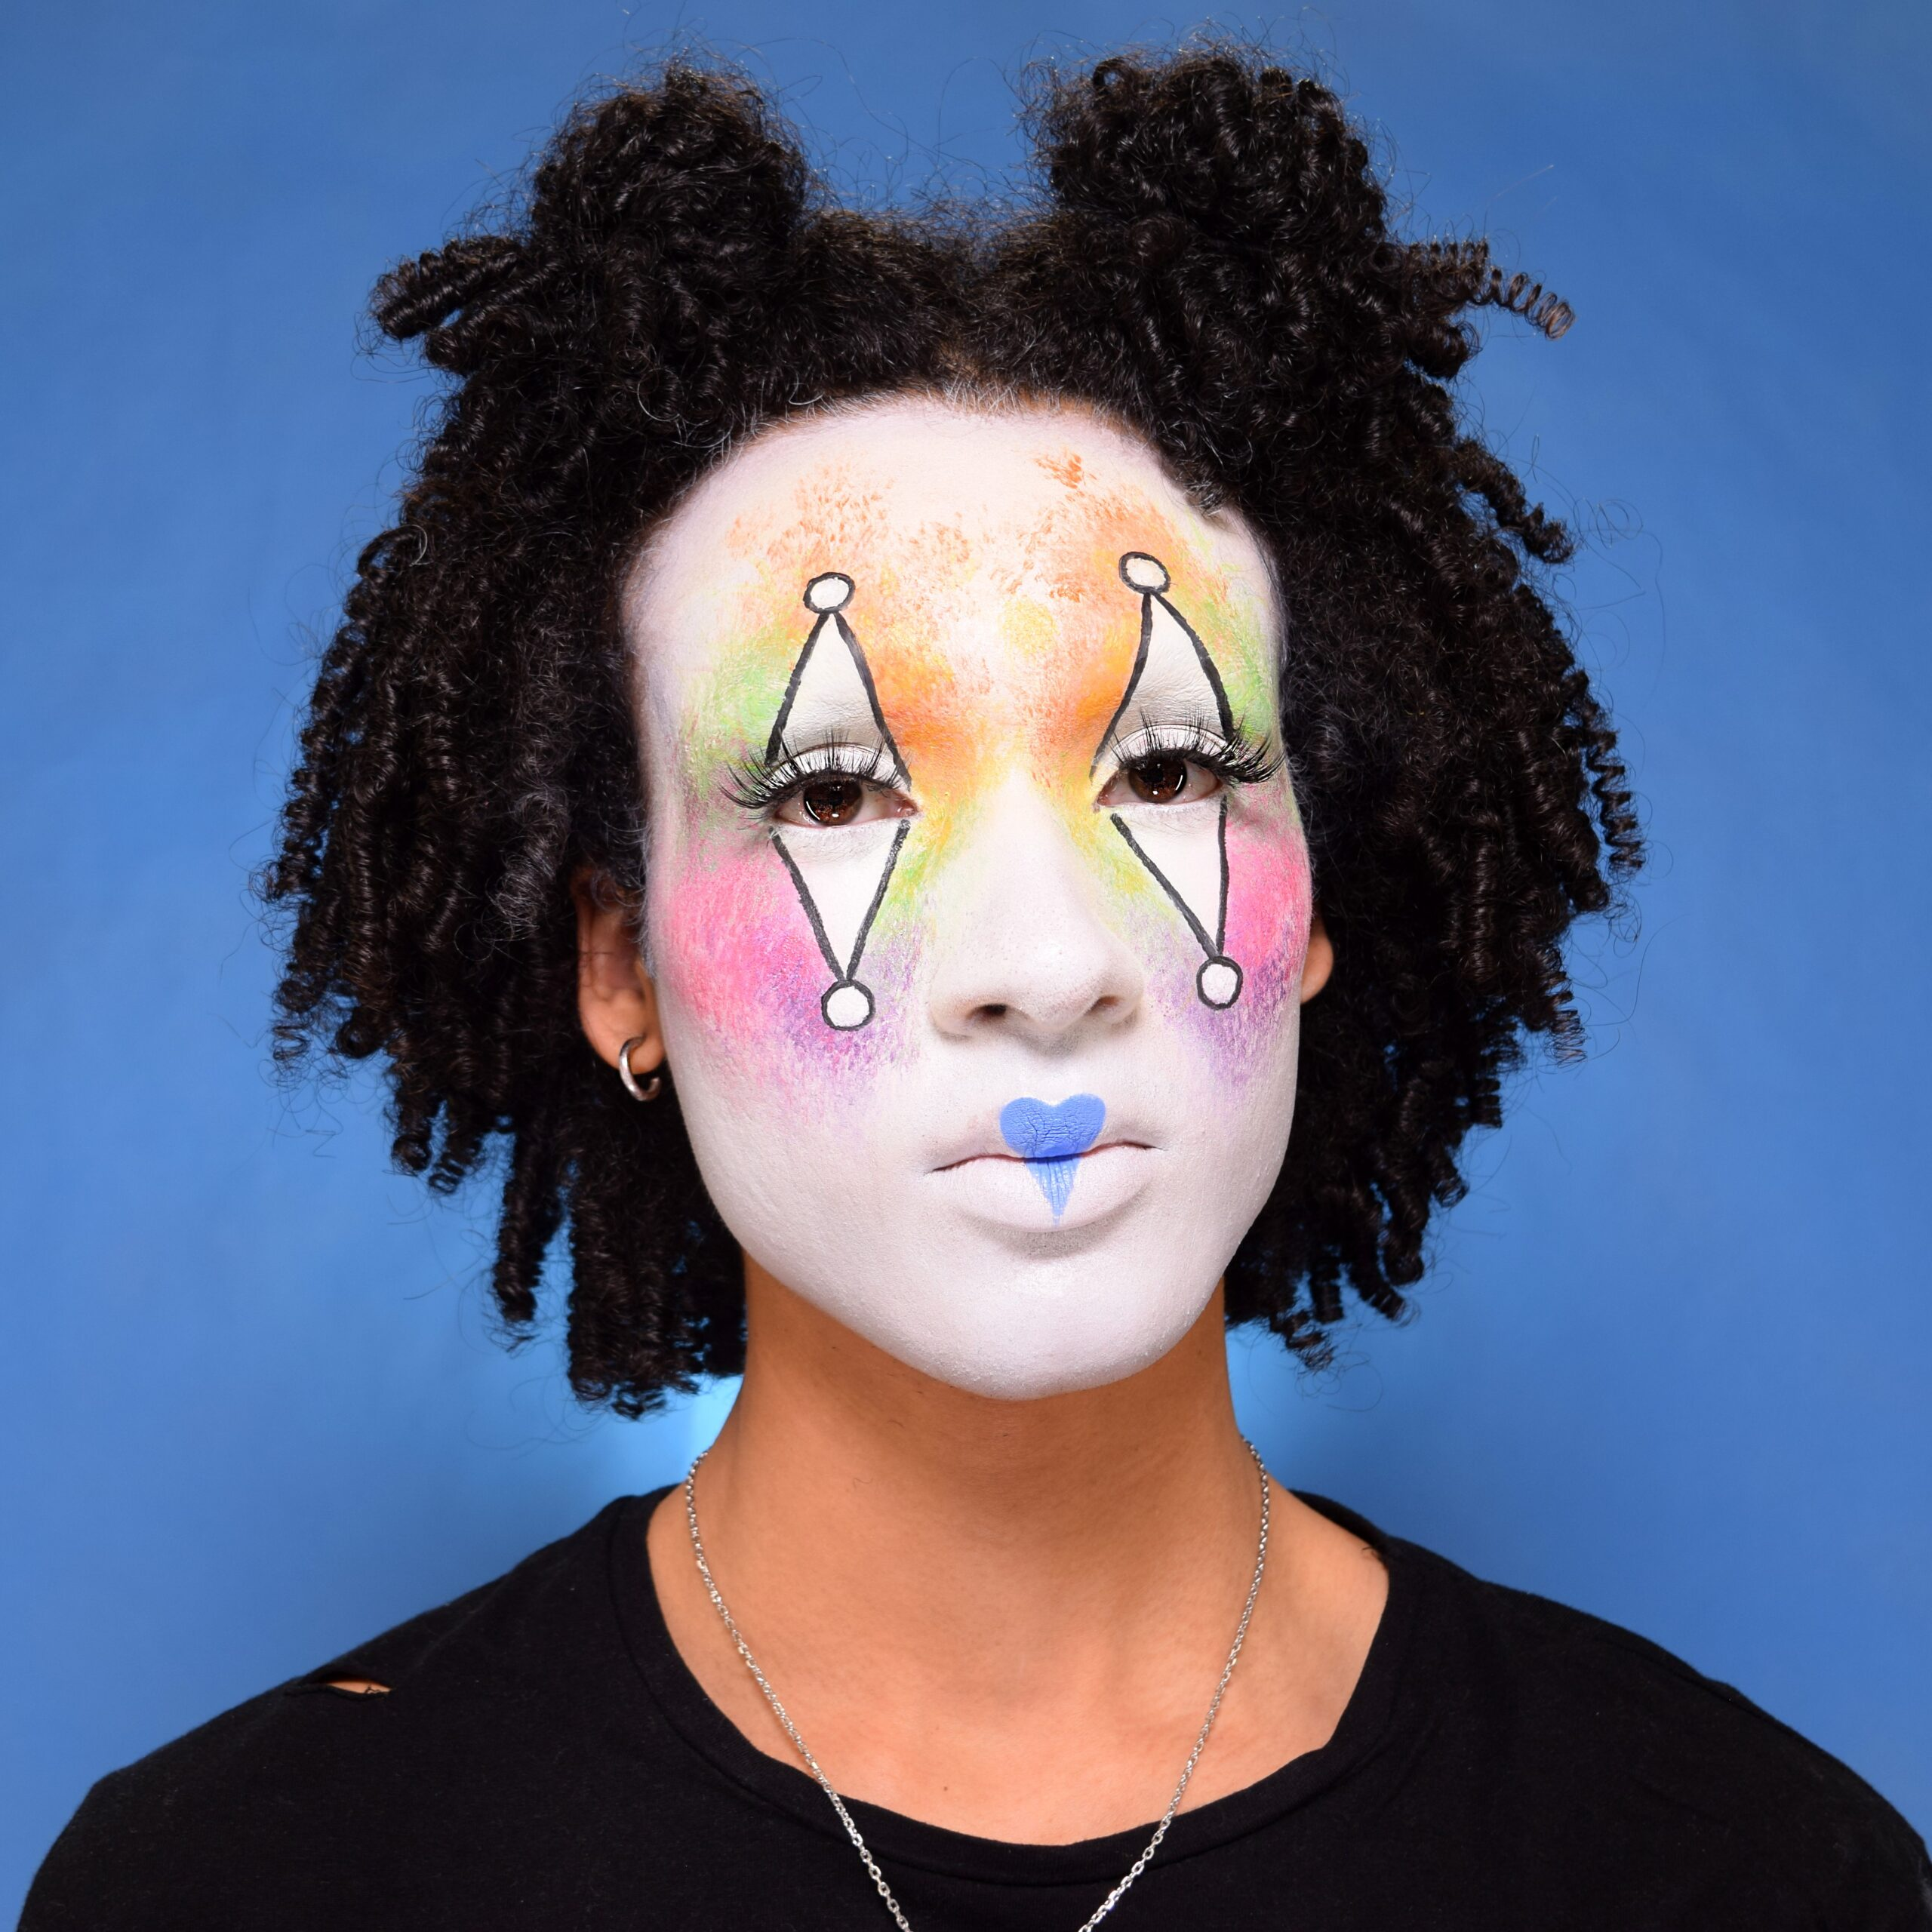 Boy with Sparkle Clown face paint design for Halloween